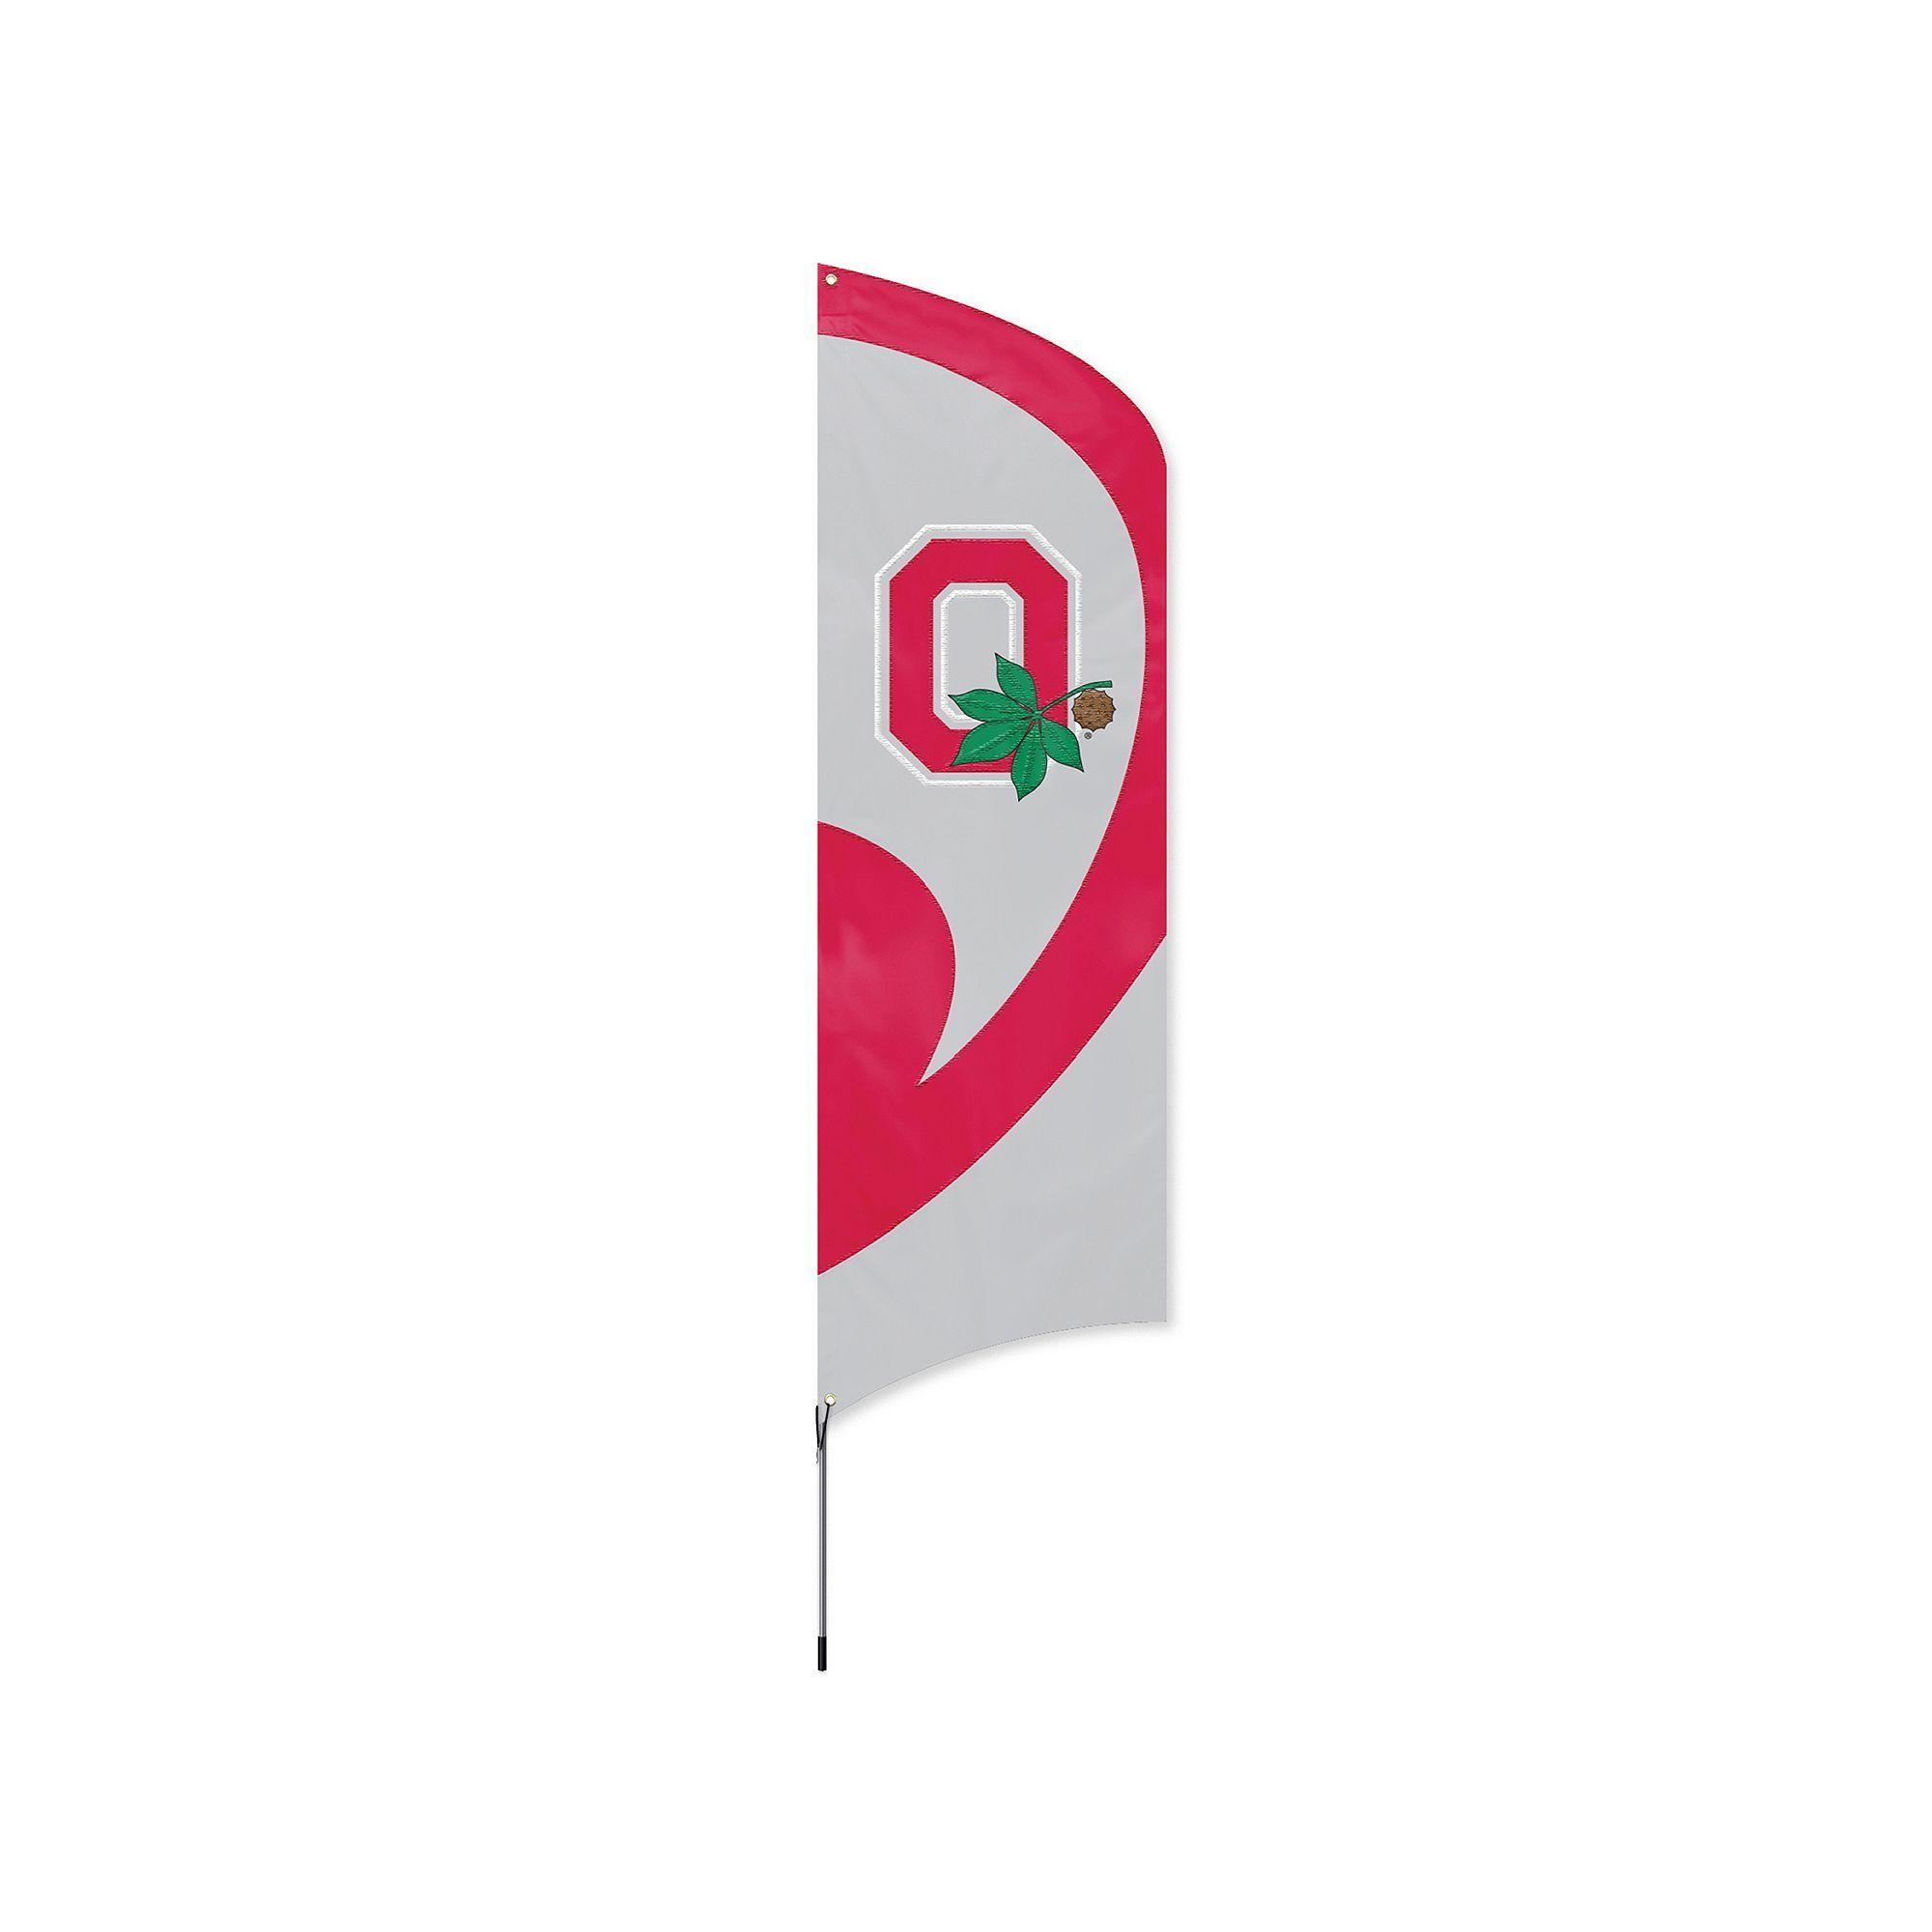 new concept b7b09 ba6e2 Ohio State Buckeyes Tall Team Flag, Multicolor   Products ...